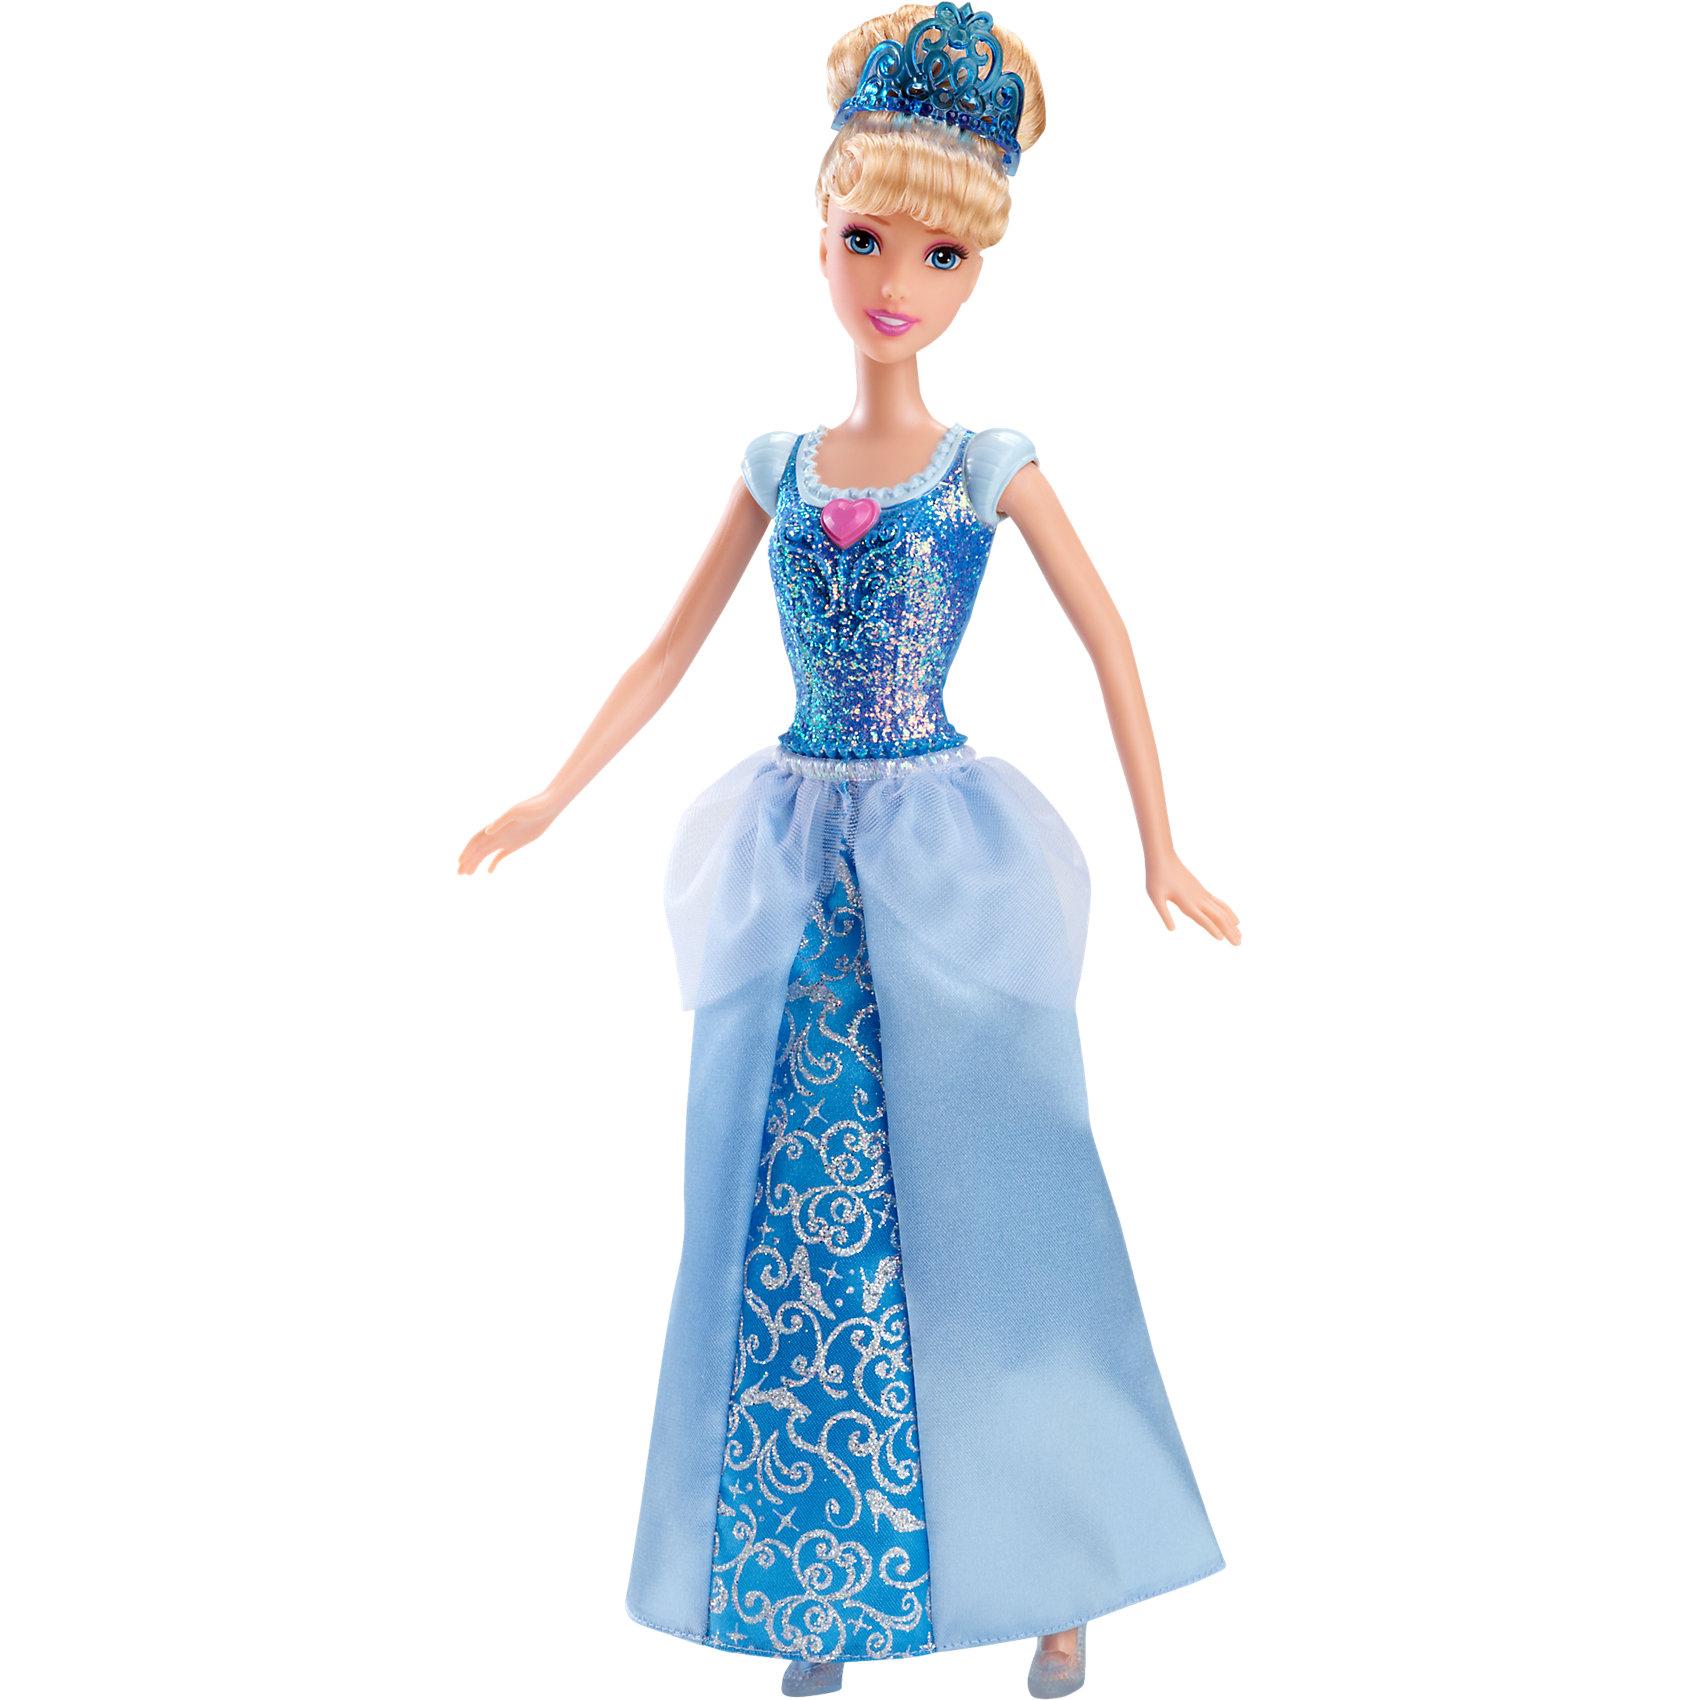 Mattel Кукла Золушка, Принцессы Дисней mattel принцесса c домиком и аксессуарами принцессы дисней